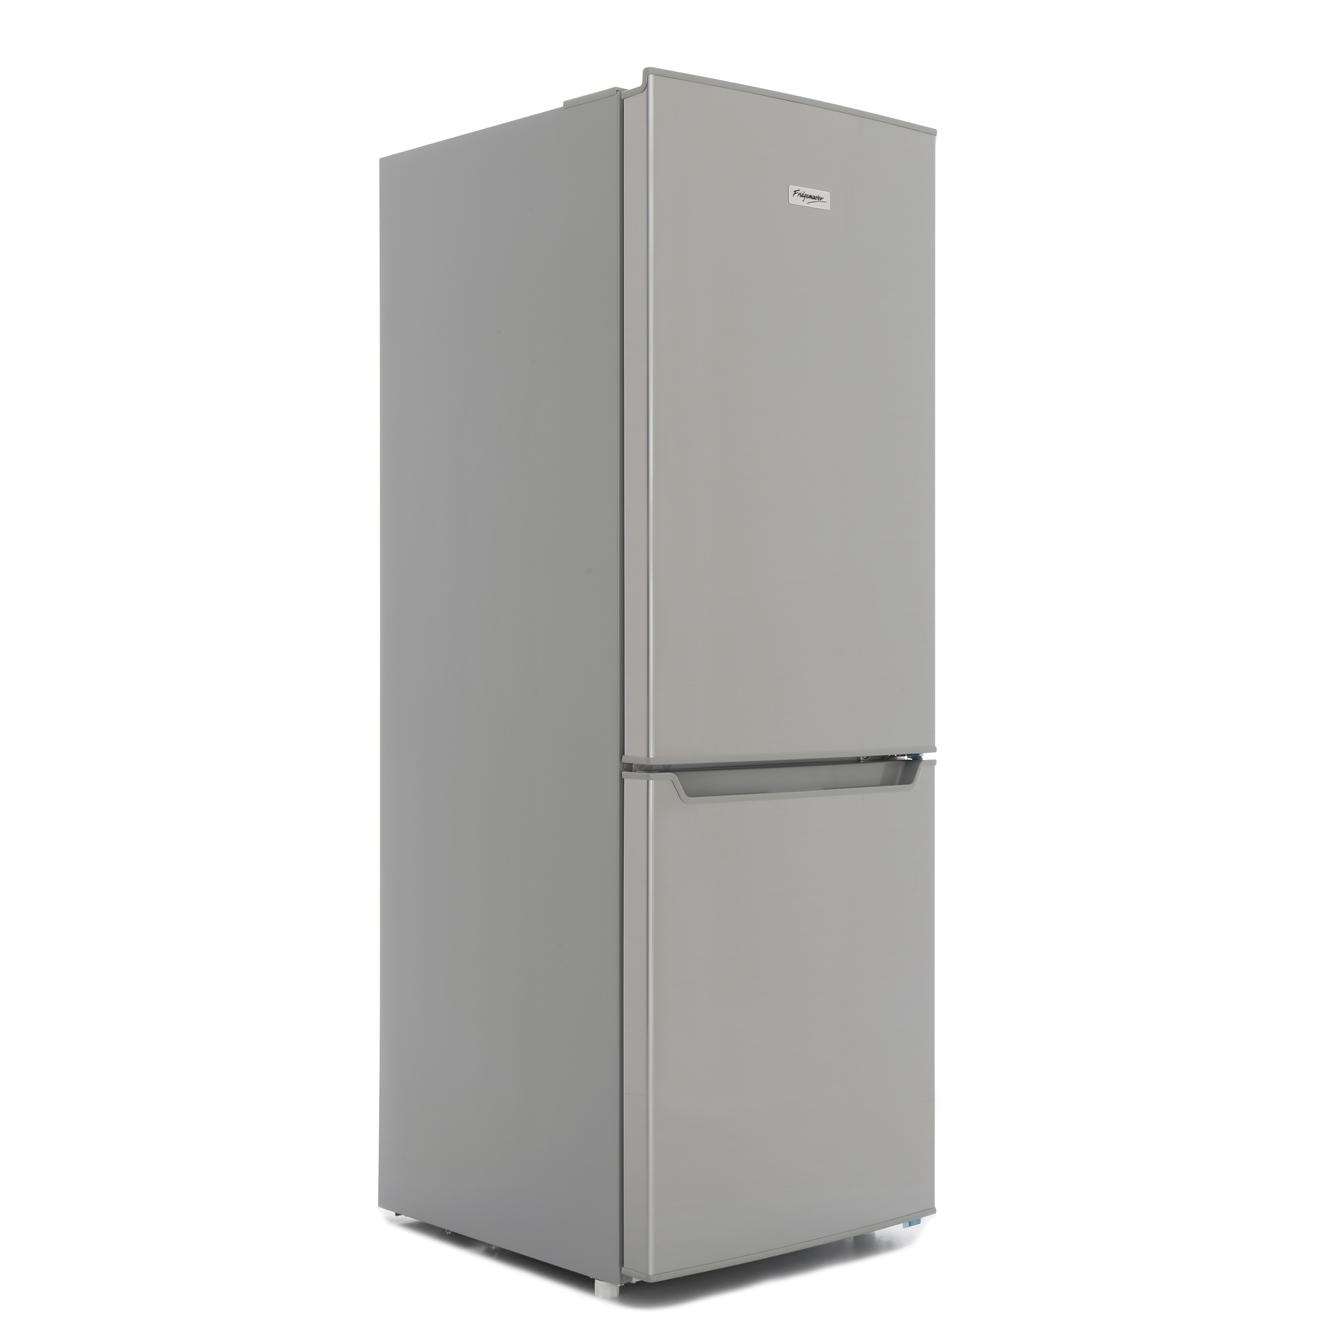 Fridgemaster MC50165S Static Fridge Freezer